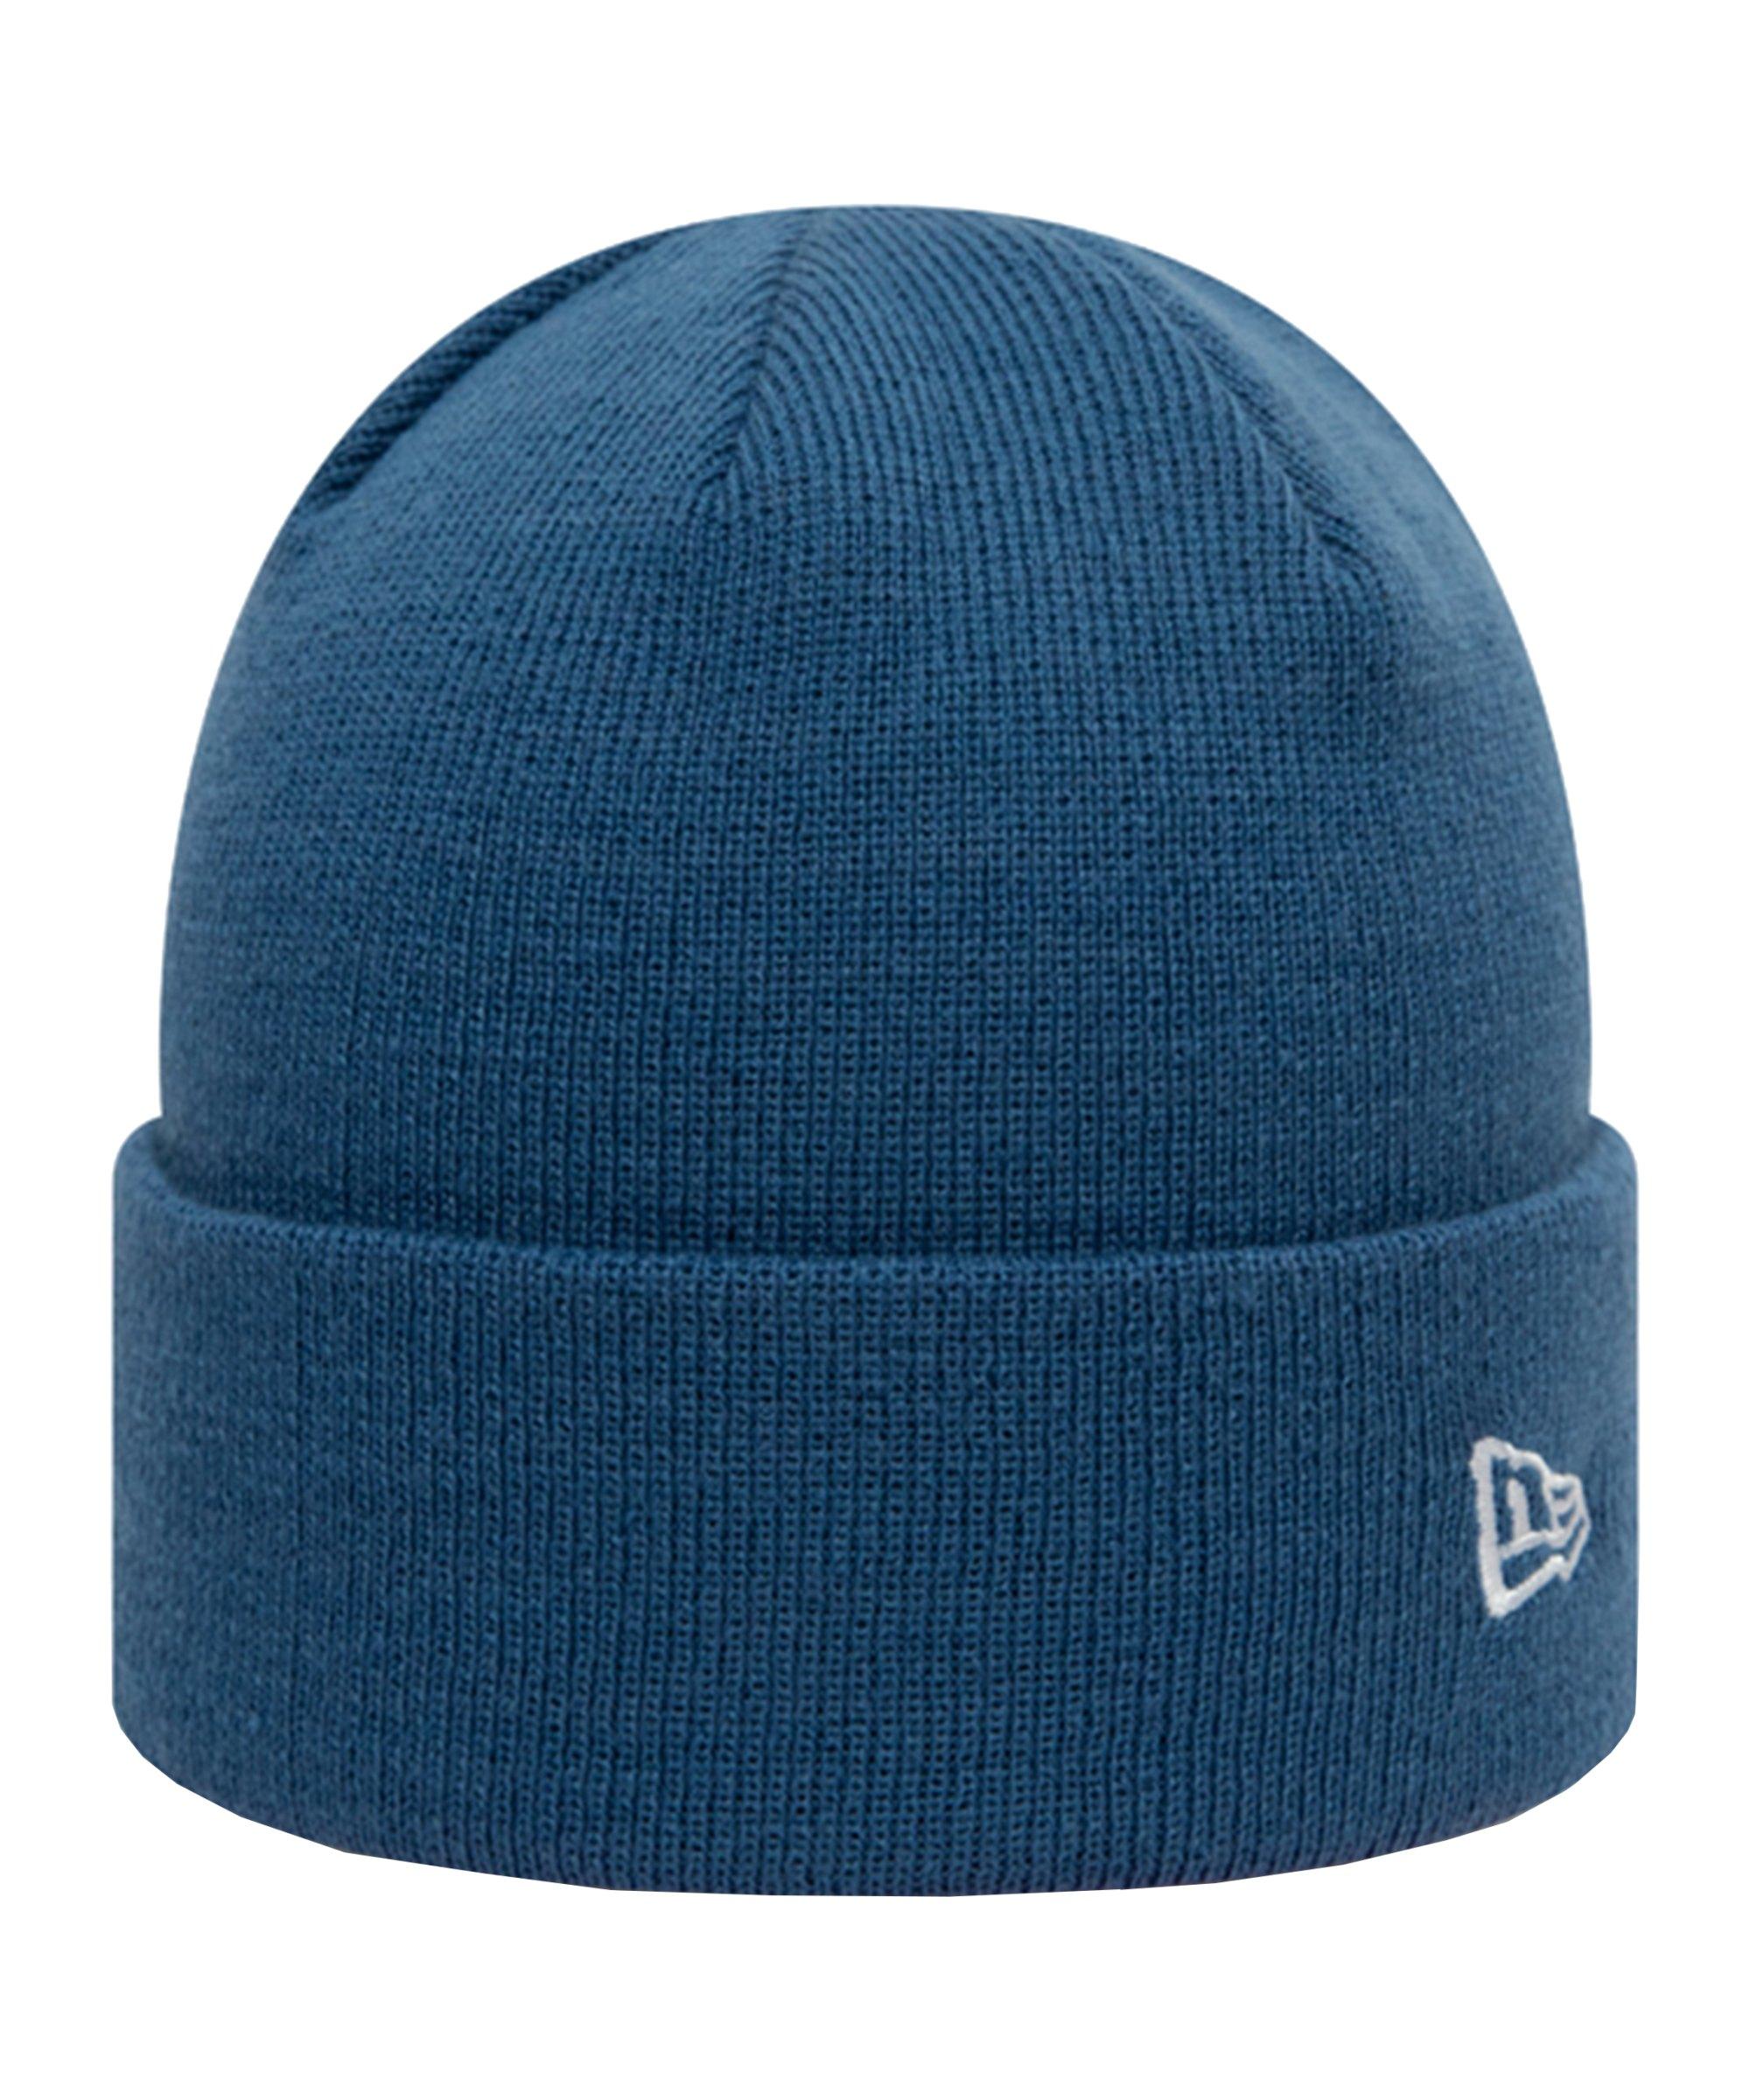 New Era Pop Cuff Knit Short Beanie Blau FIND - blau